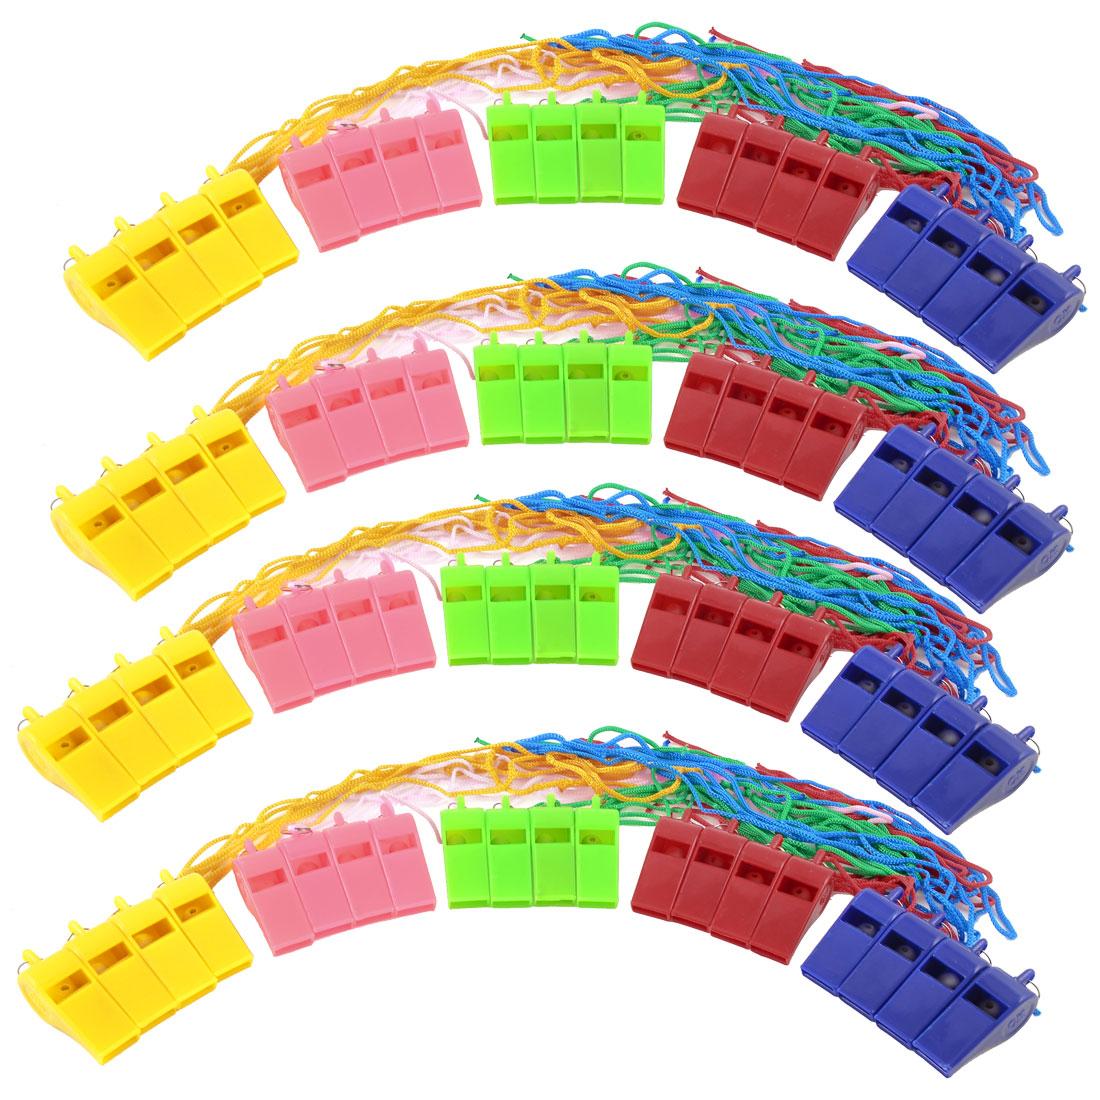 20 Pcs Assorte Color Coach Nylon Neck StringReferee Type Whistles